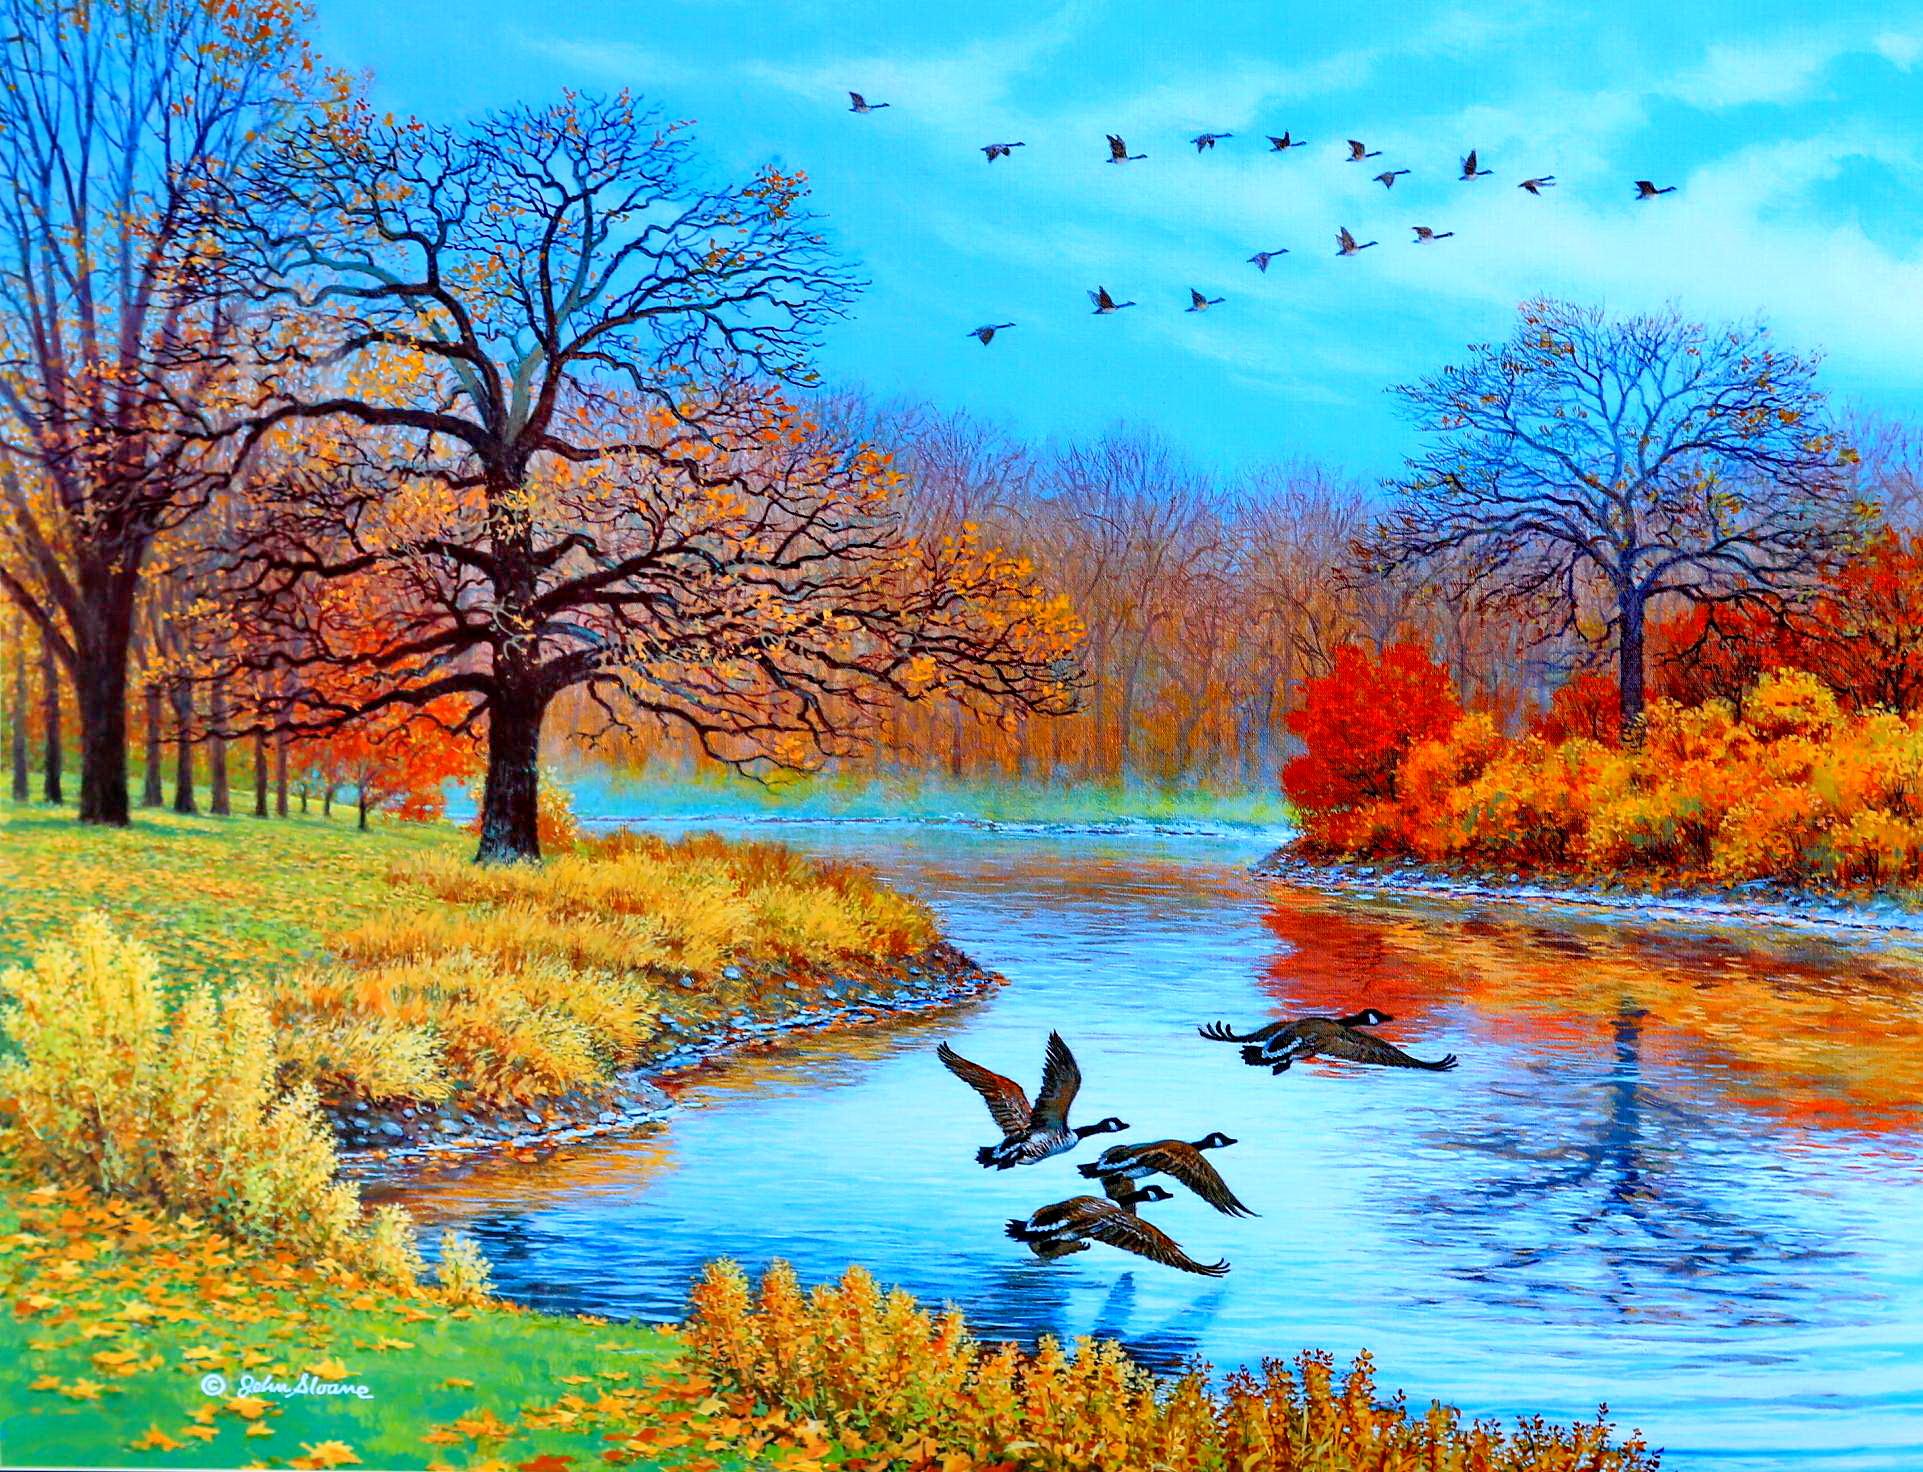 Peaceful Nature 4k Wallpaper Wallpapersimages Org